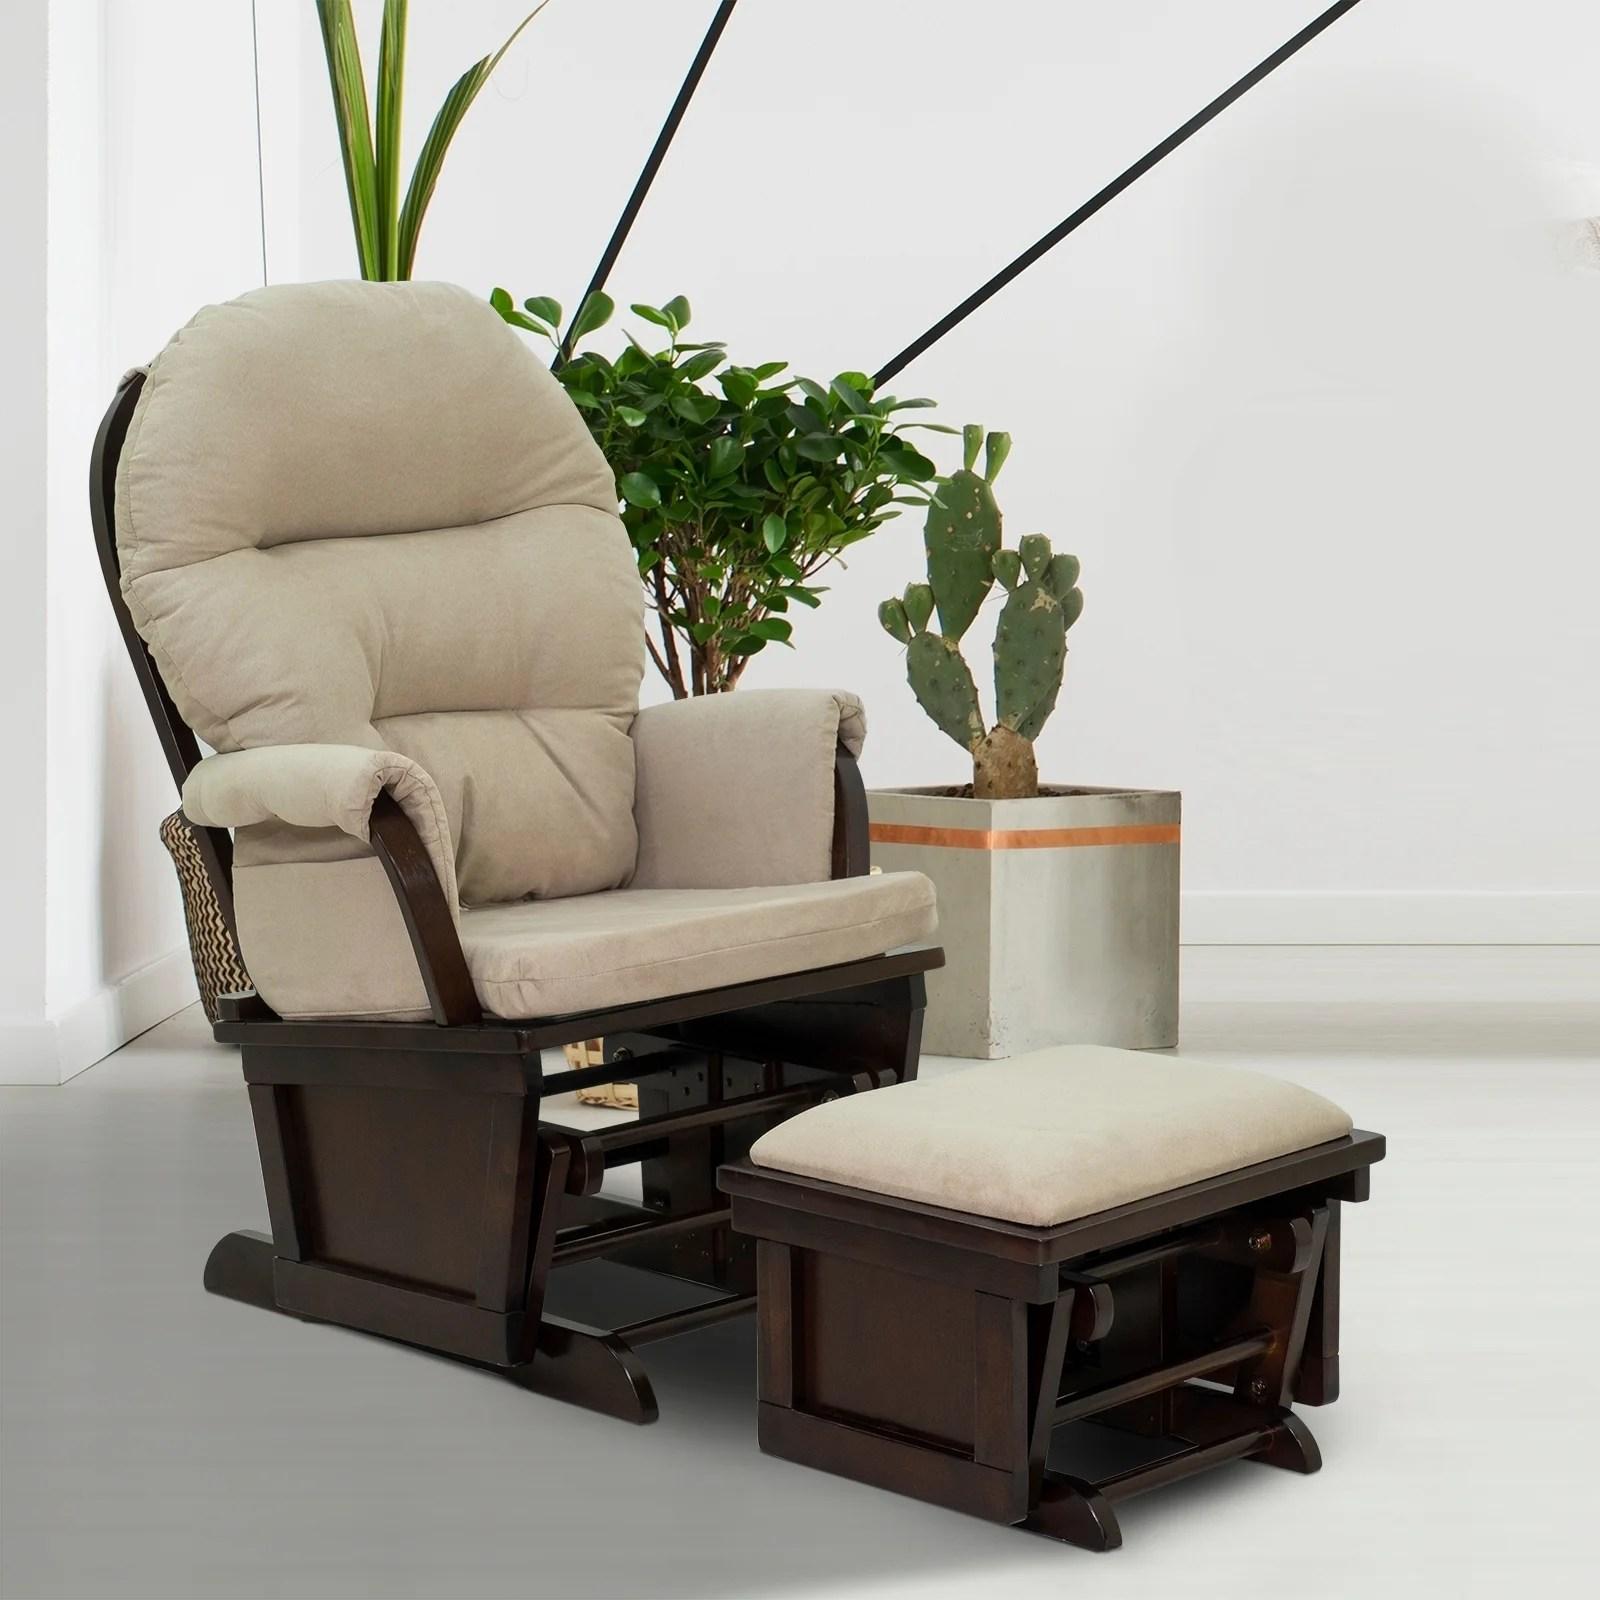 Homcom Nursery Glider Slider Rocking Chair With Ottoman Set Overstock 28258359 Cream